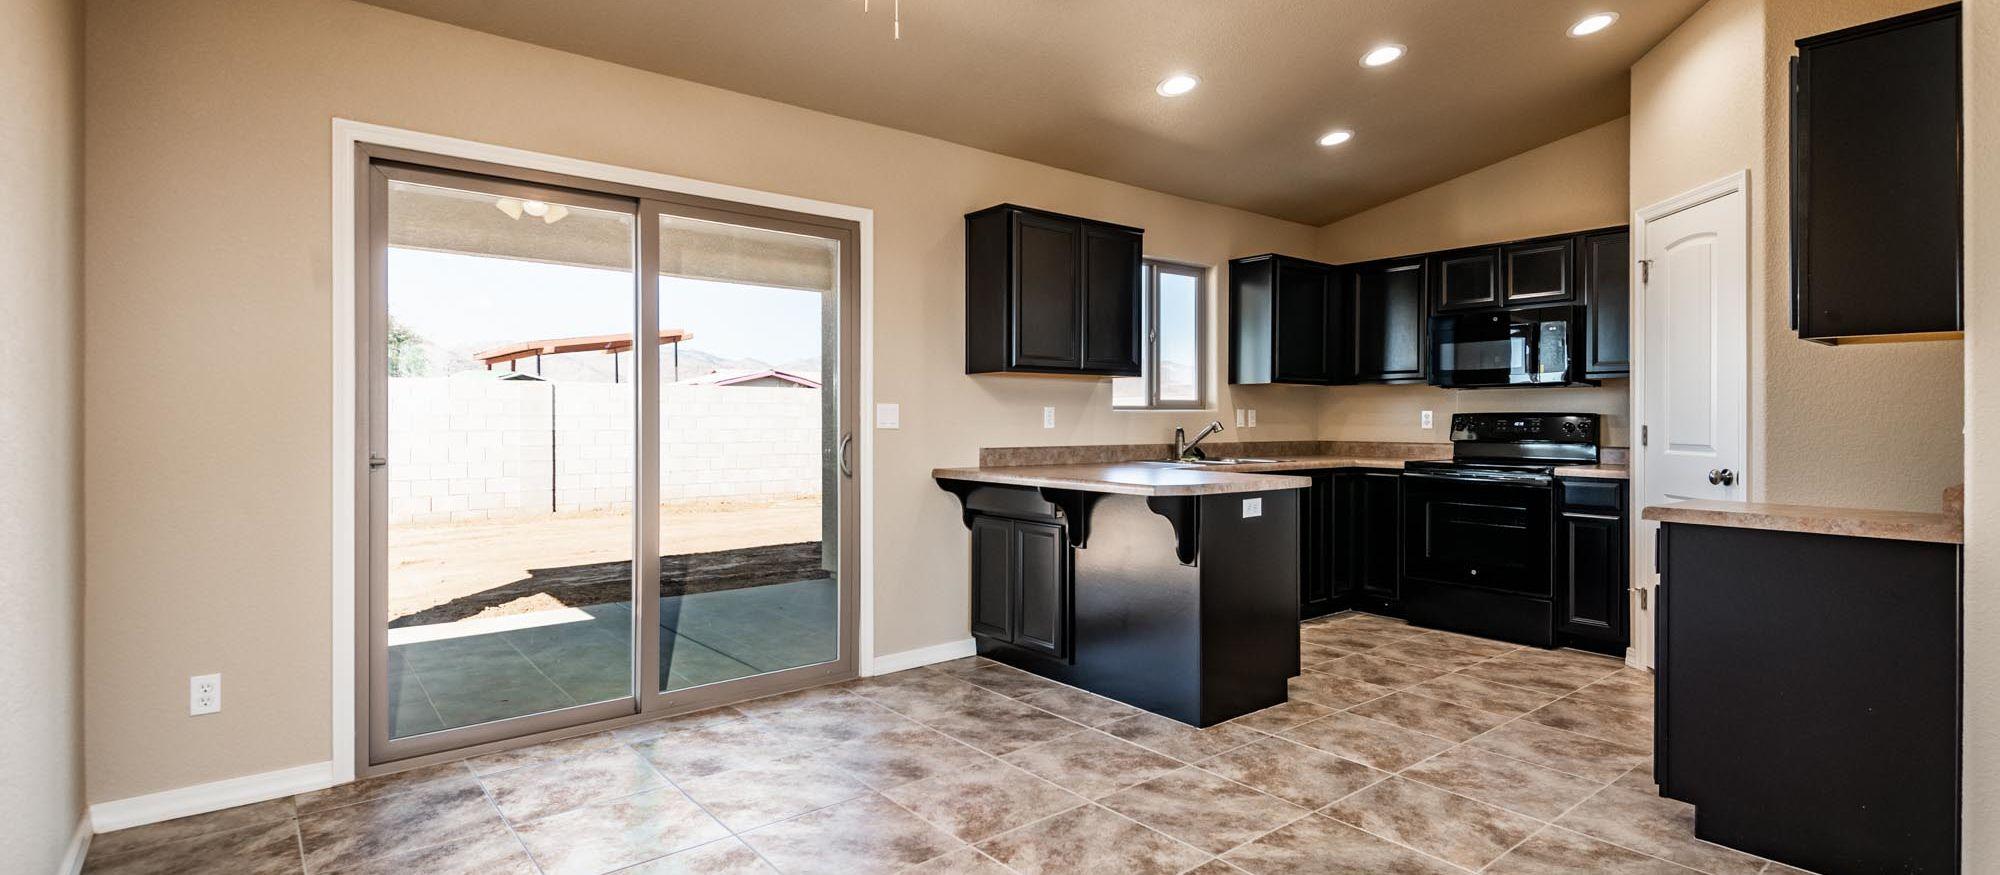 Kitchen featured in the Juniper Junior 1205 By Angle Homes in Kingman-Lake Havasu City, AZ